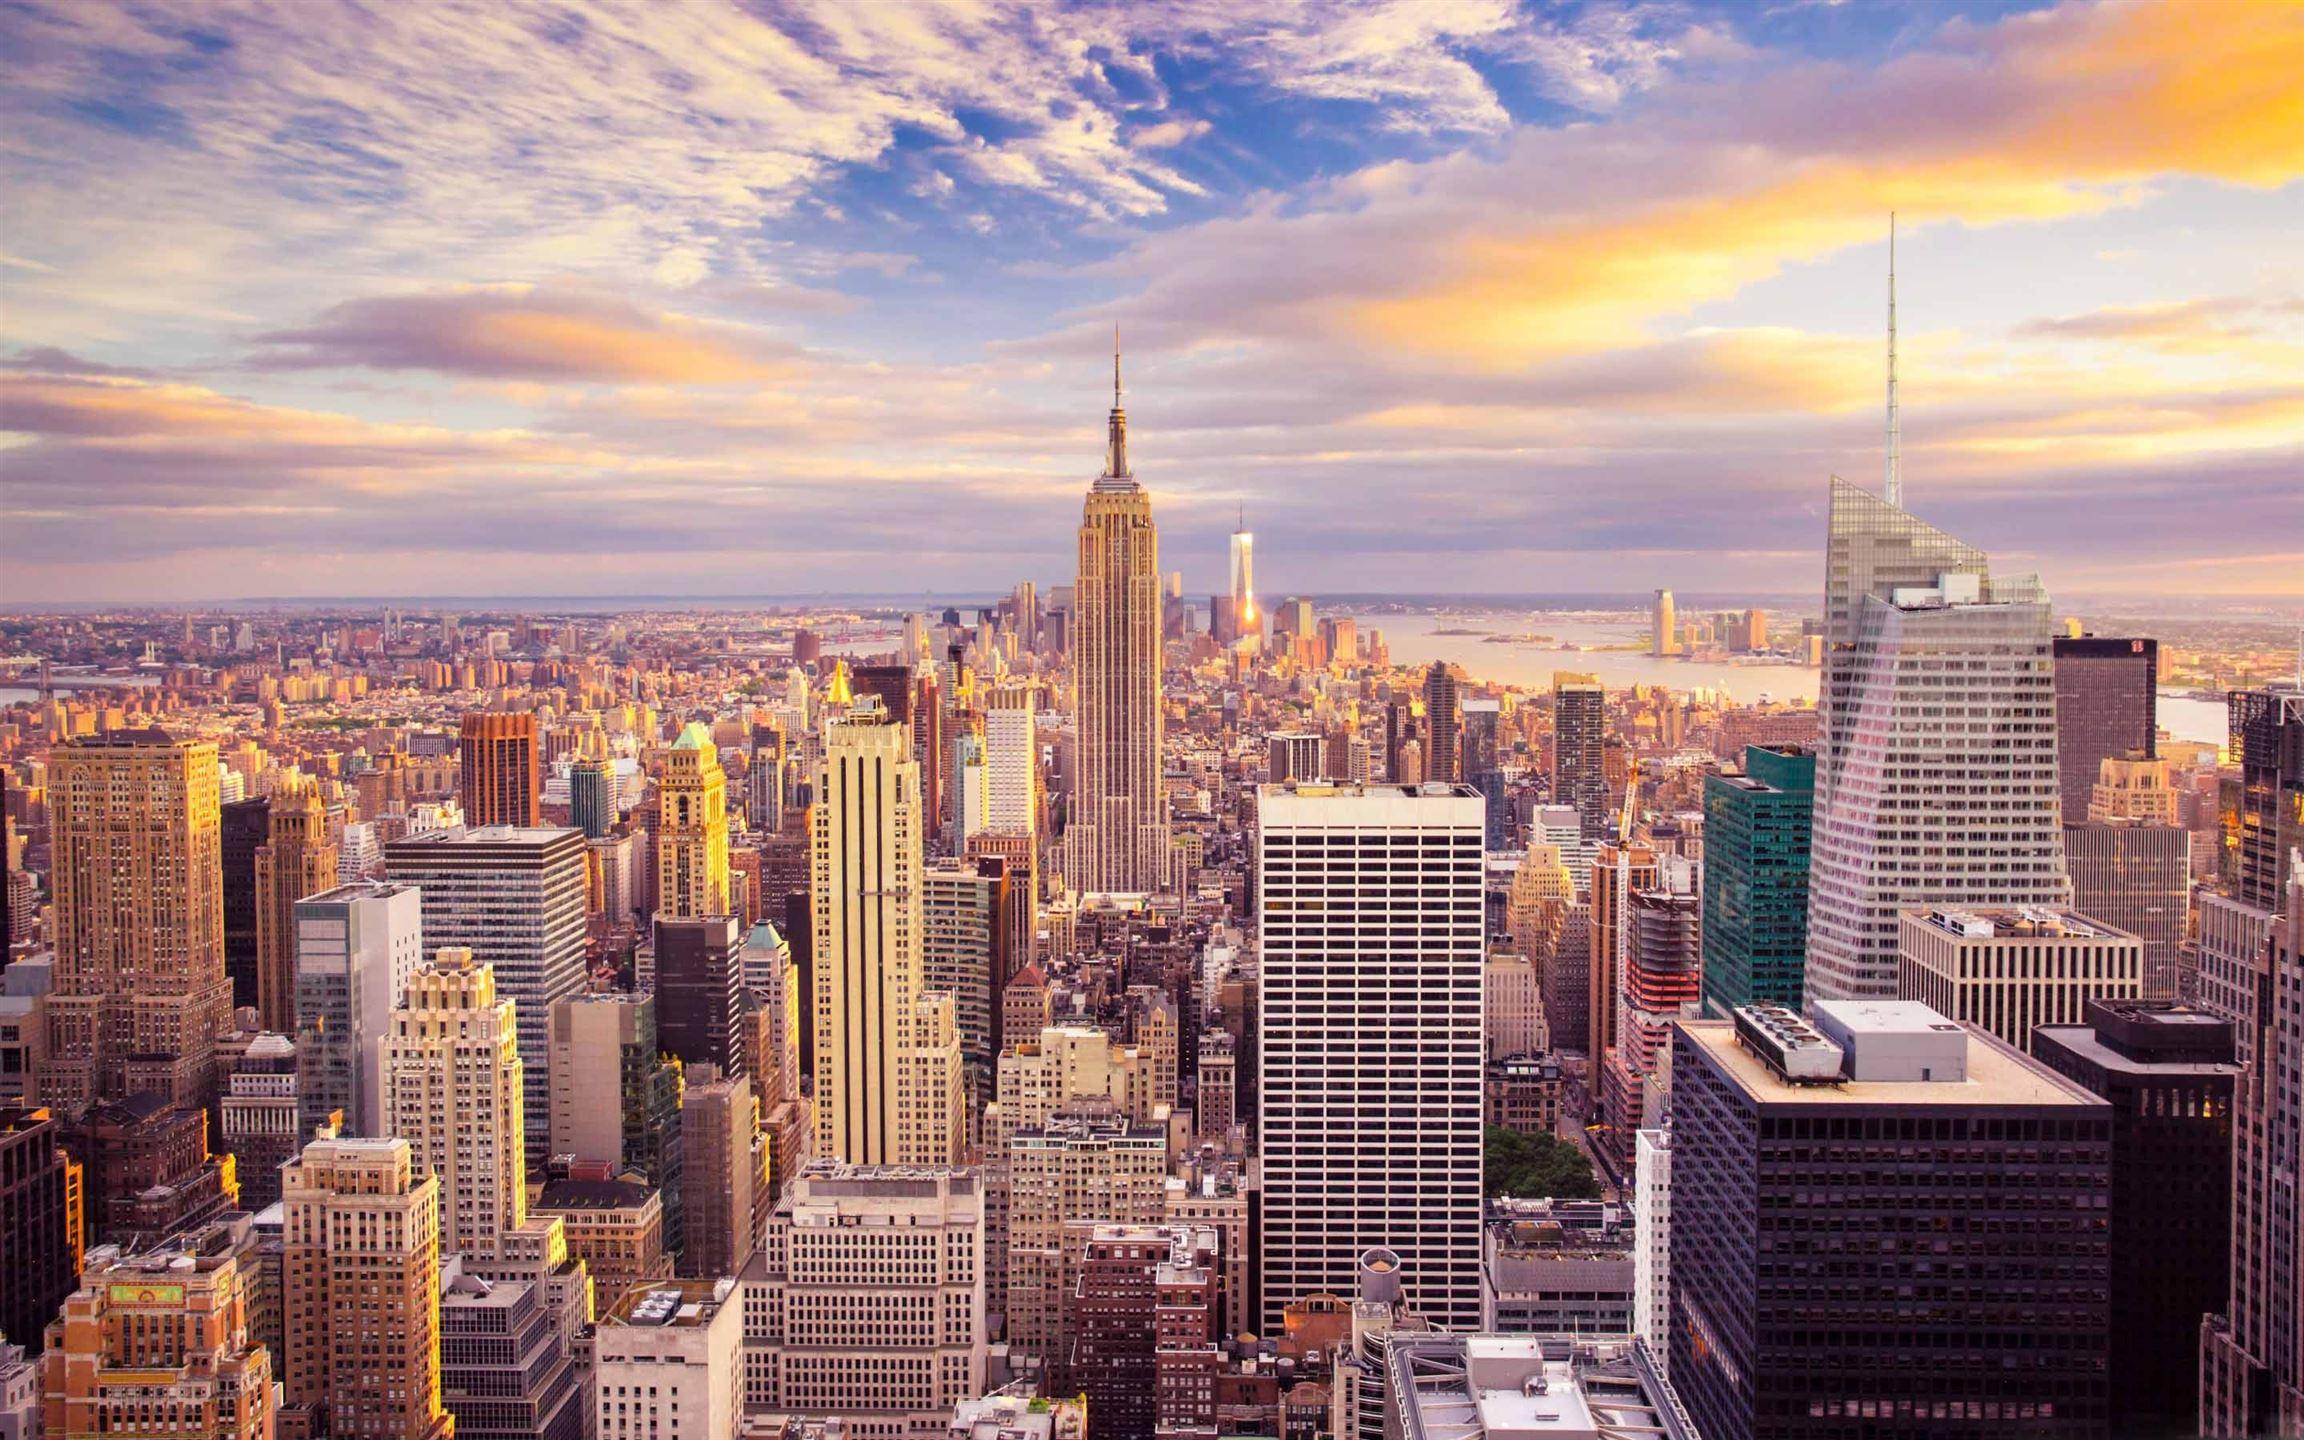 New York City Building Macbook Air Wallpaper Download Allmacwallpaper